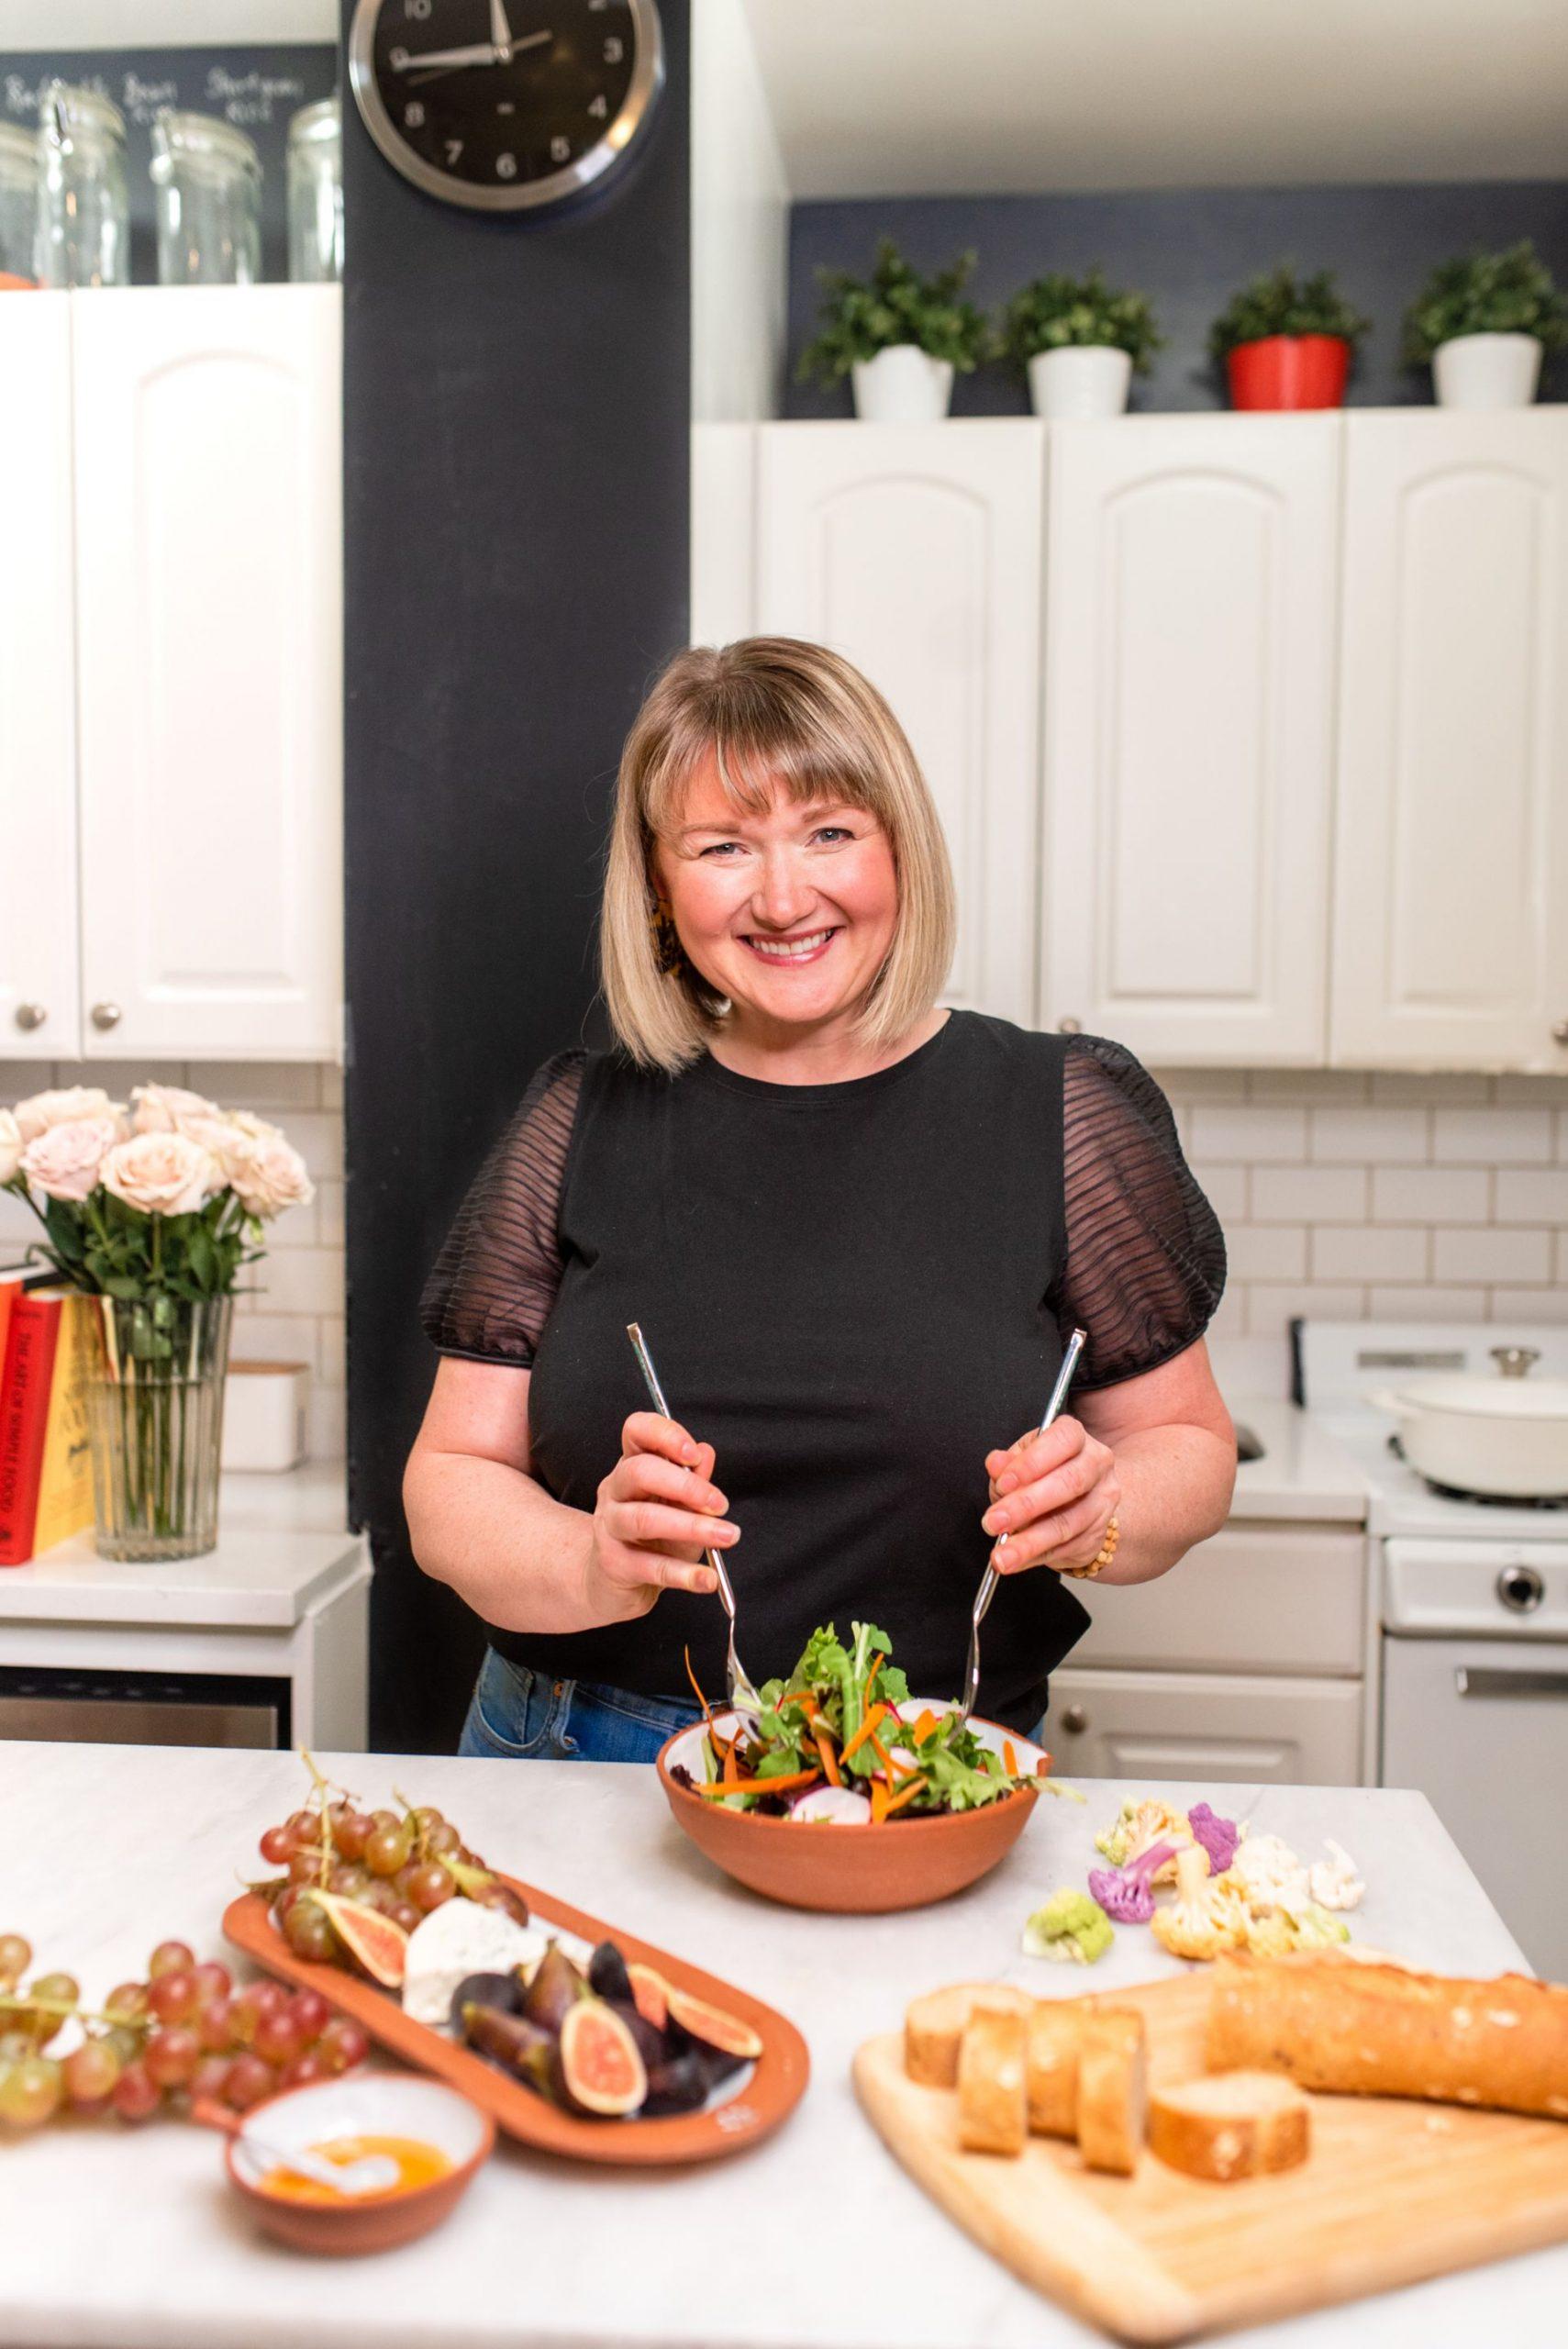 Indoor food blogger branding photoshoot inspiration - Karya Schanilec Photography